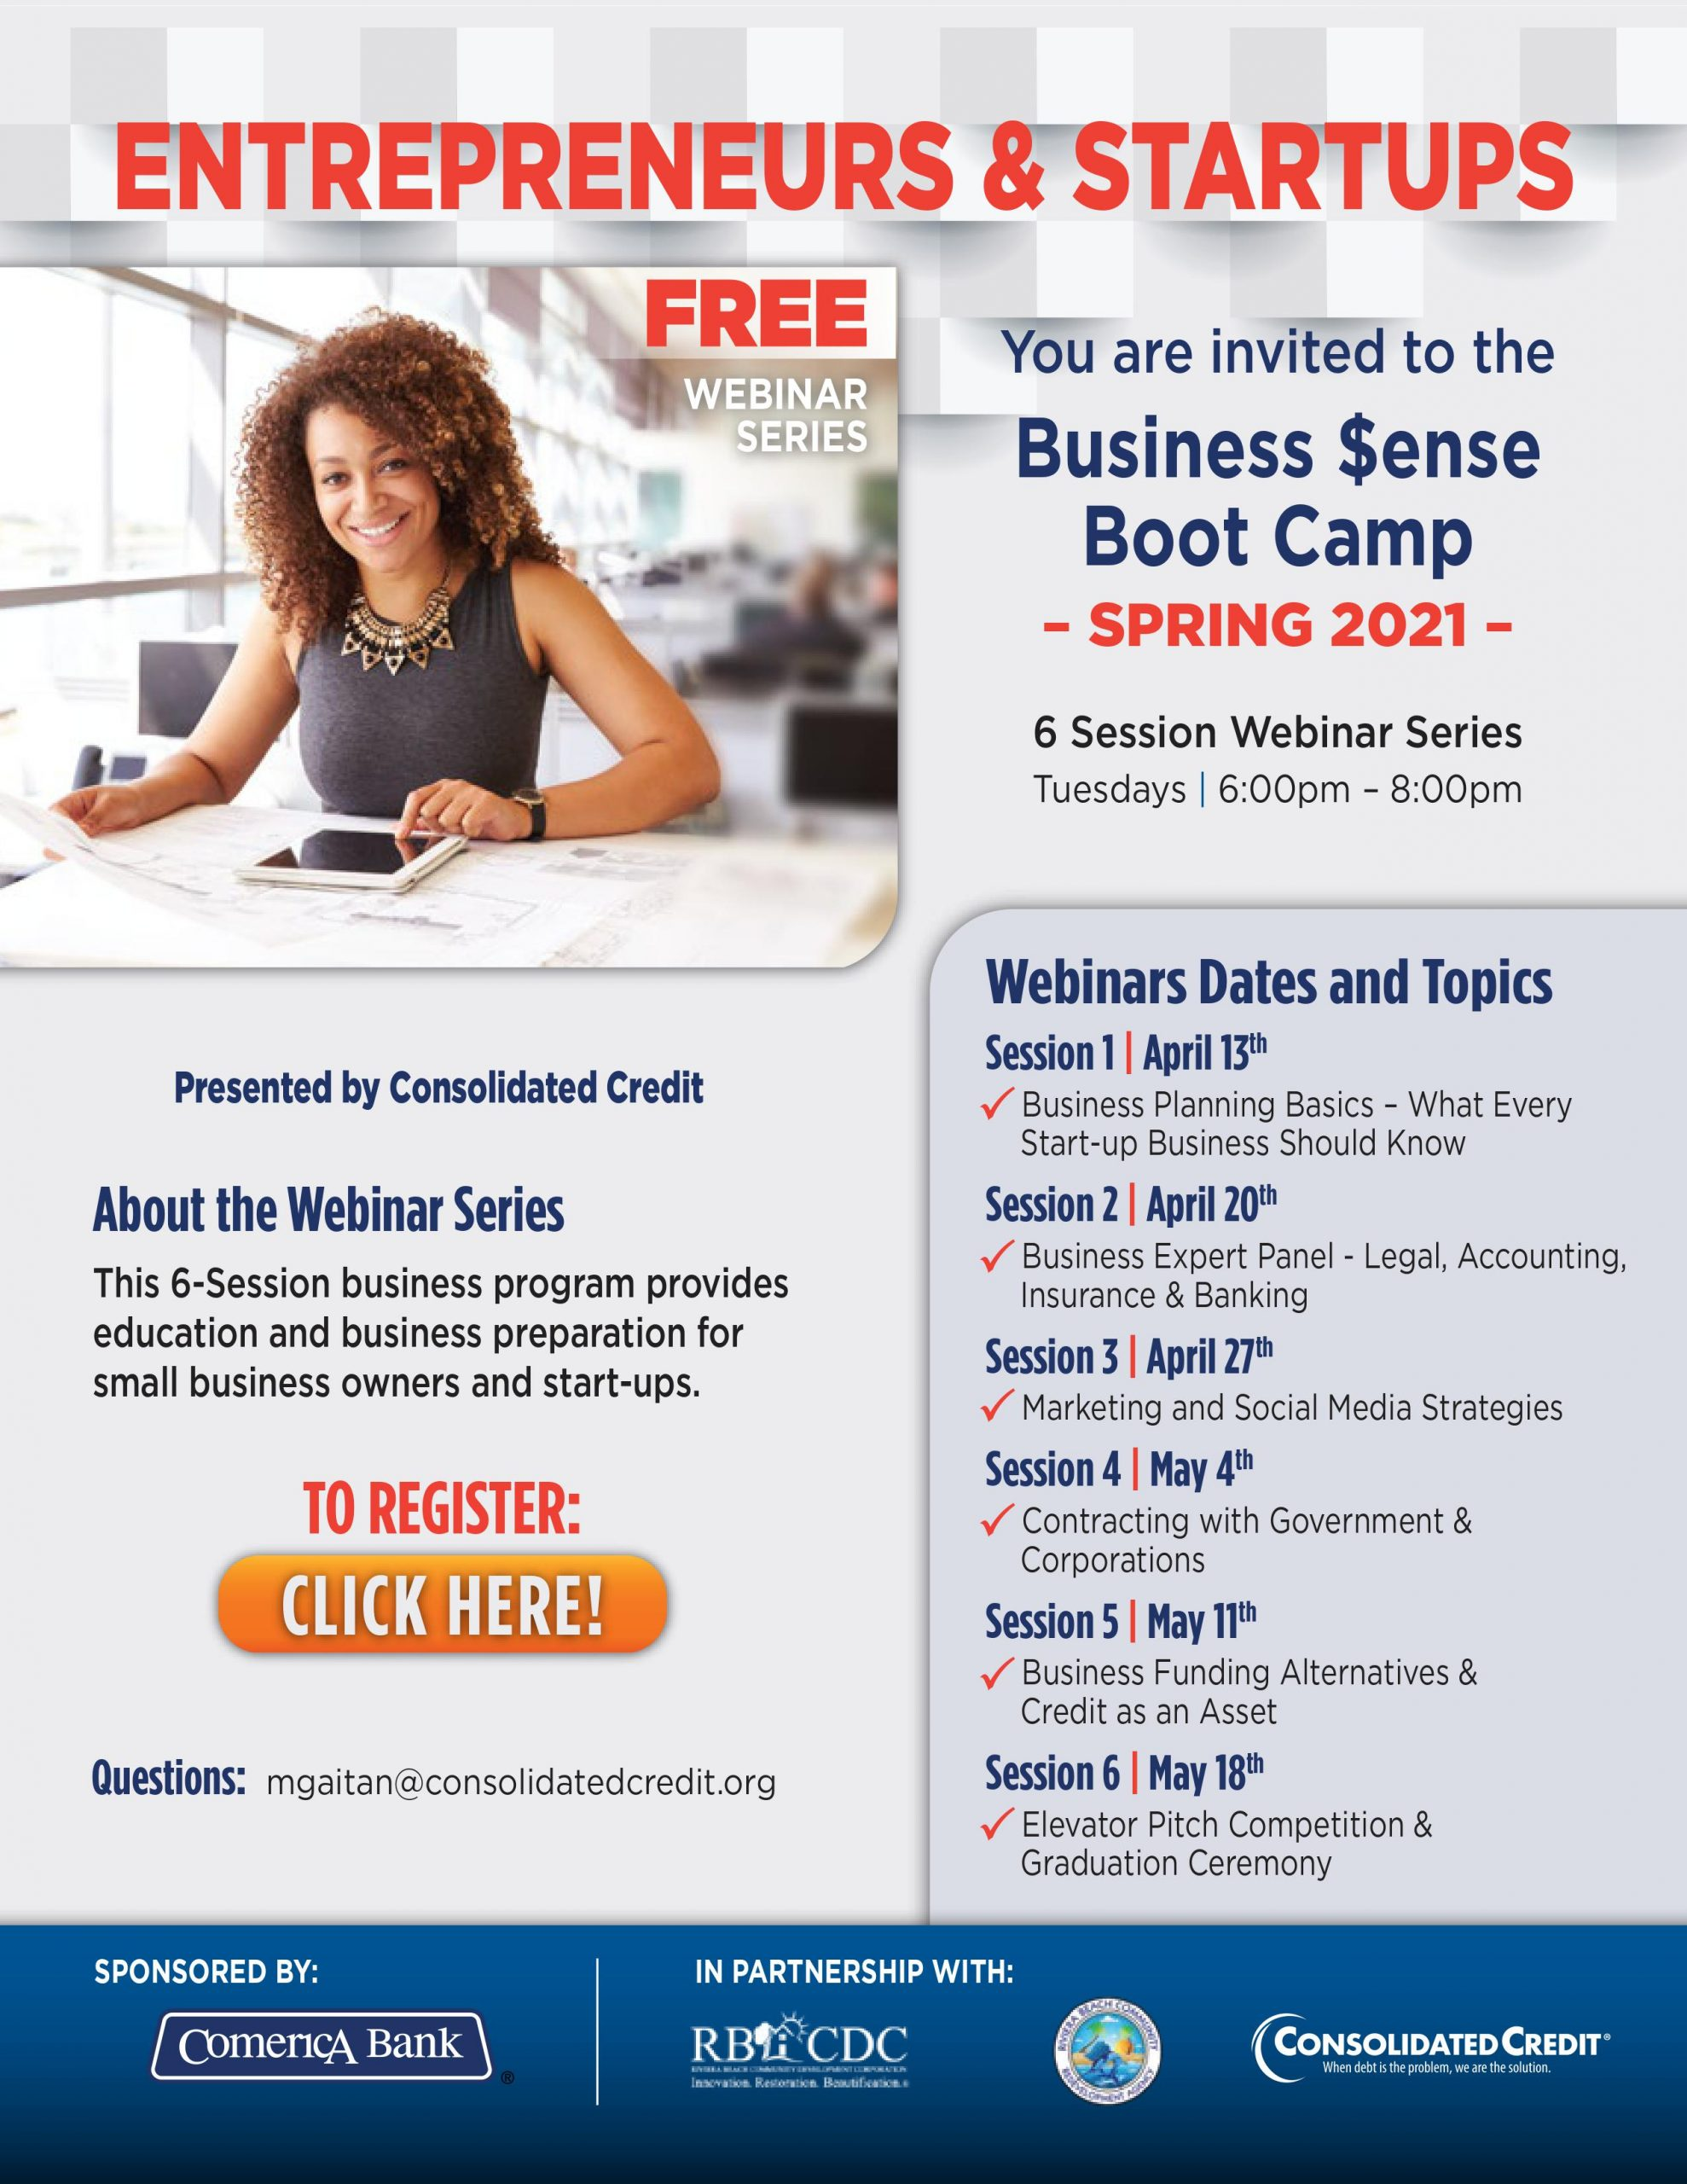 FREE Business $ense Boot Camp Webinar Series